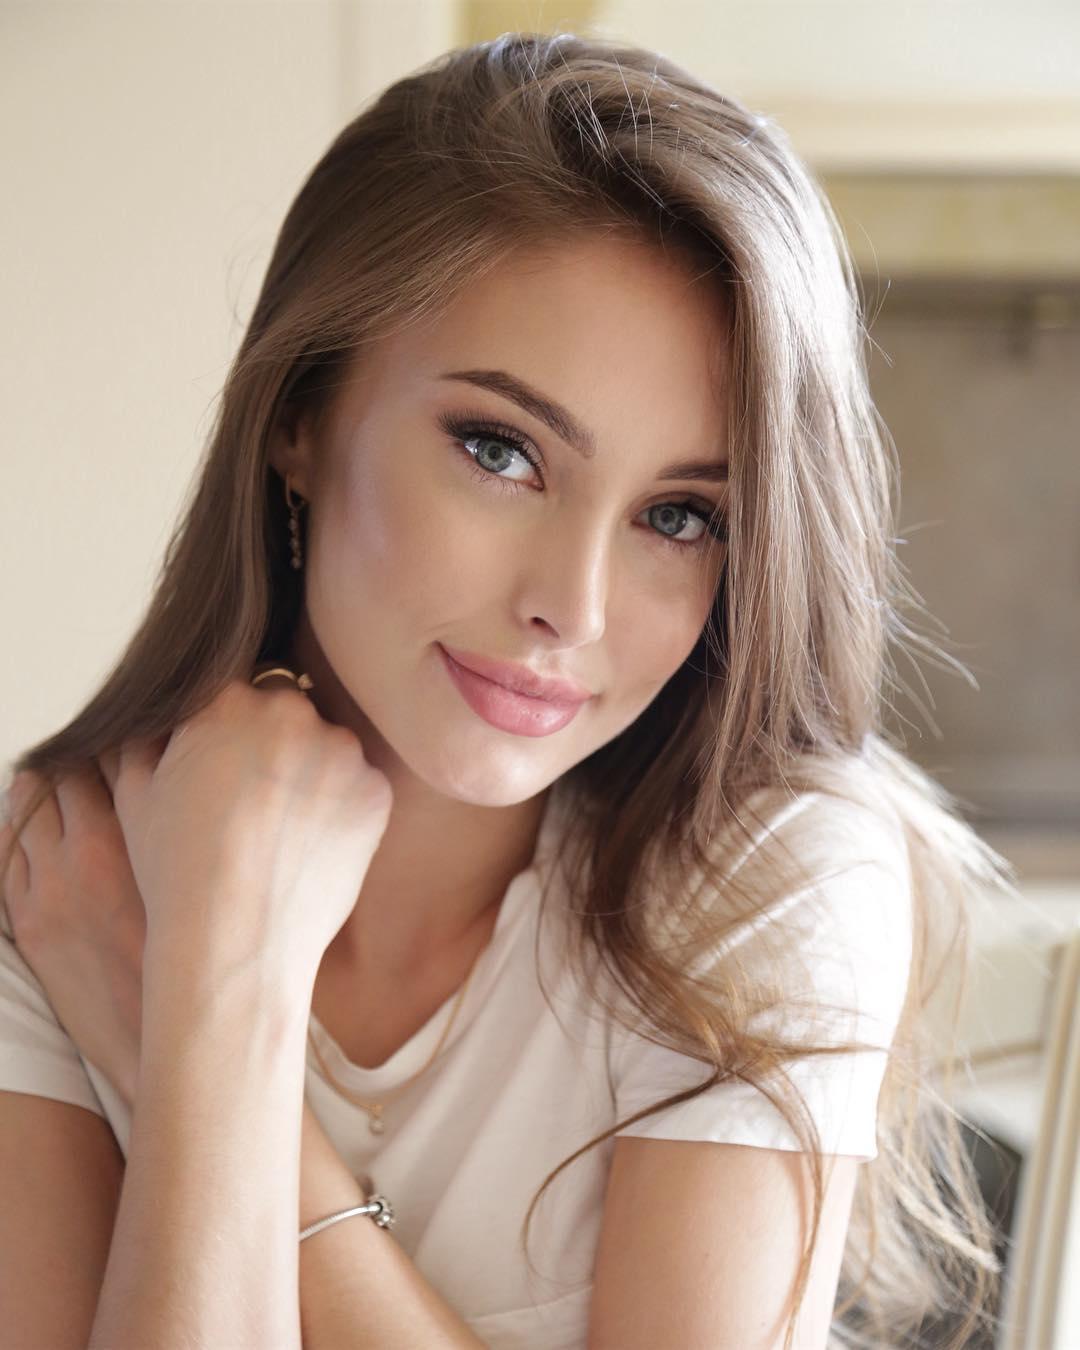 The most beautiful Russian girls | Pretty girls